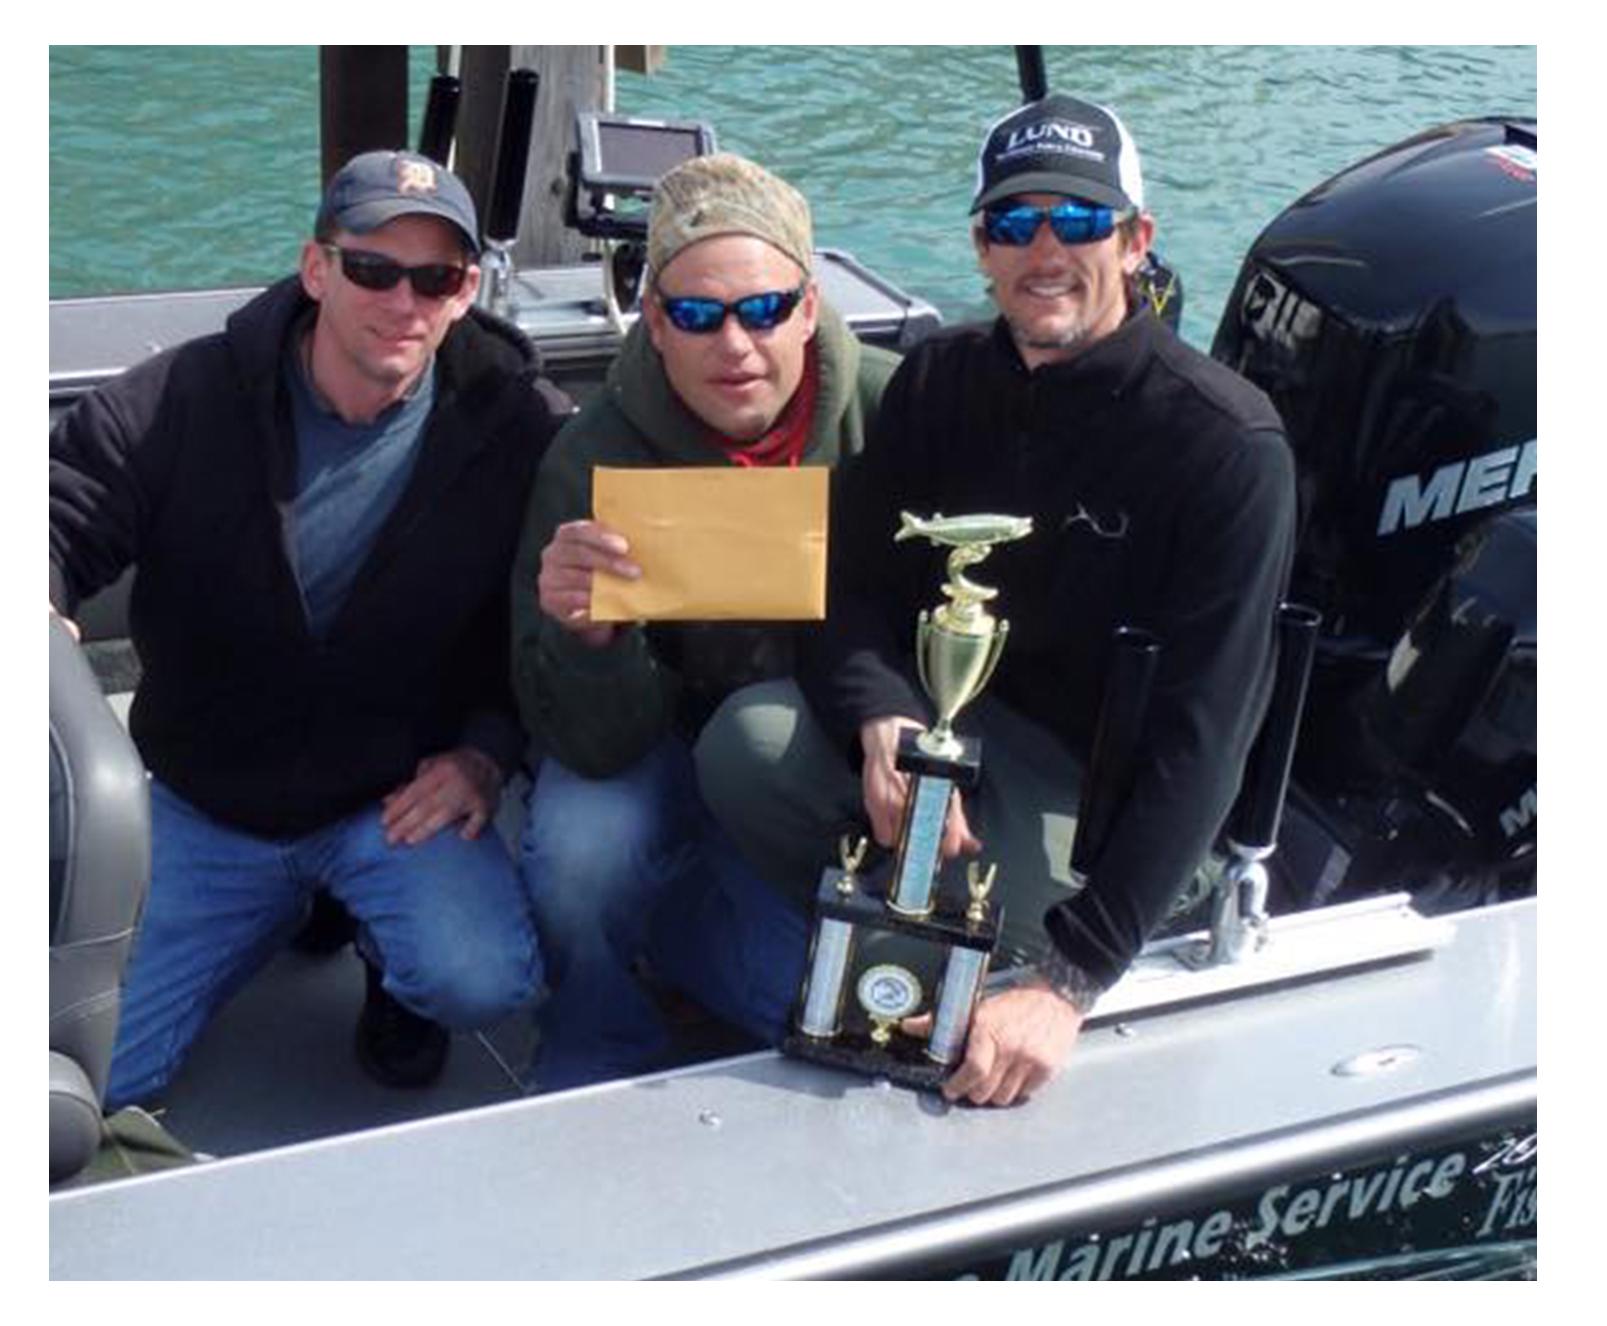 TOURNAMENT HIGHLIGHTS - Championship Caliber Sports Fishing